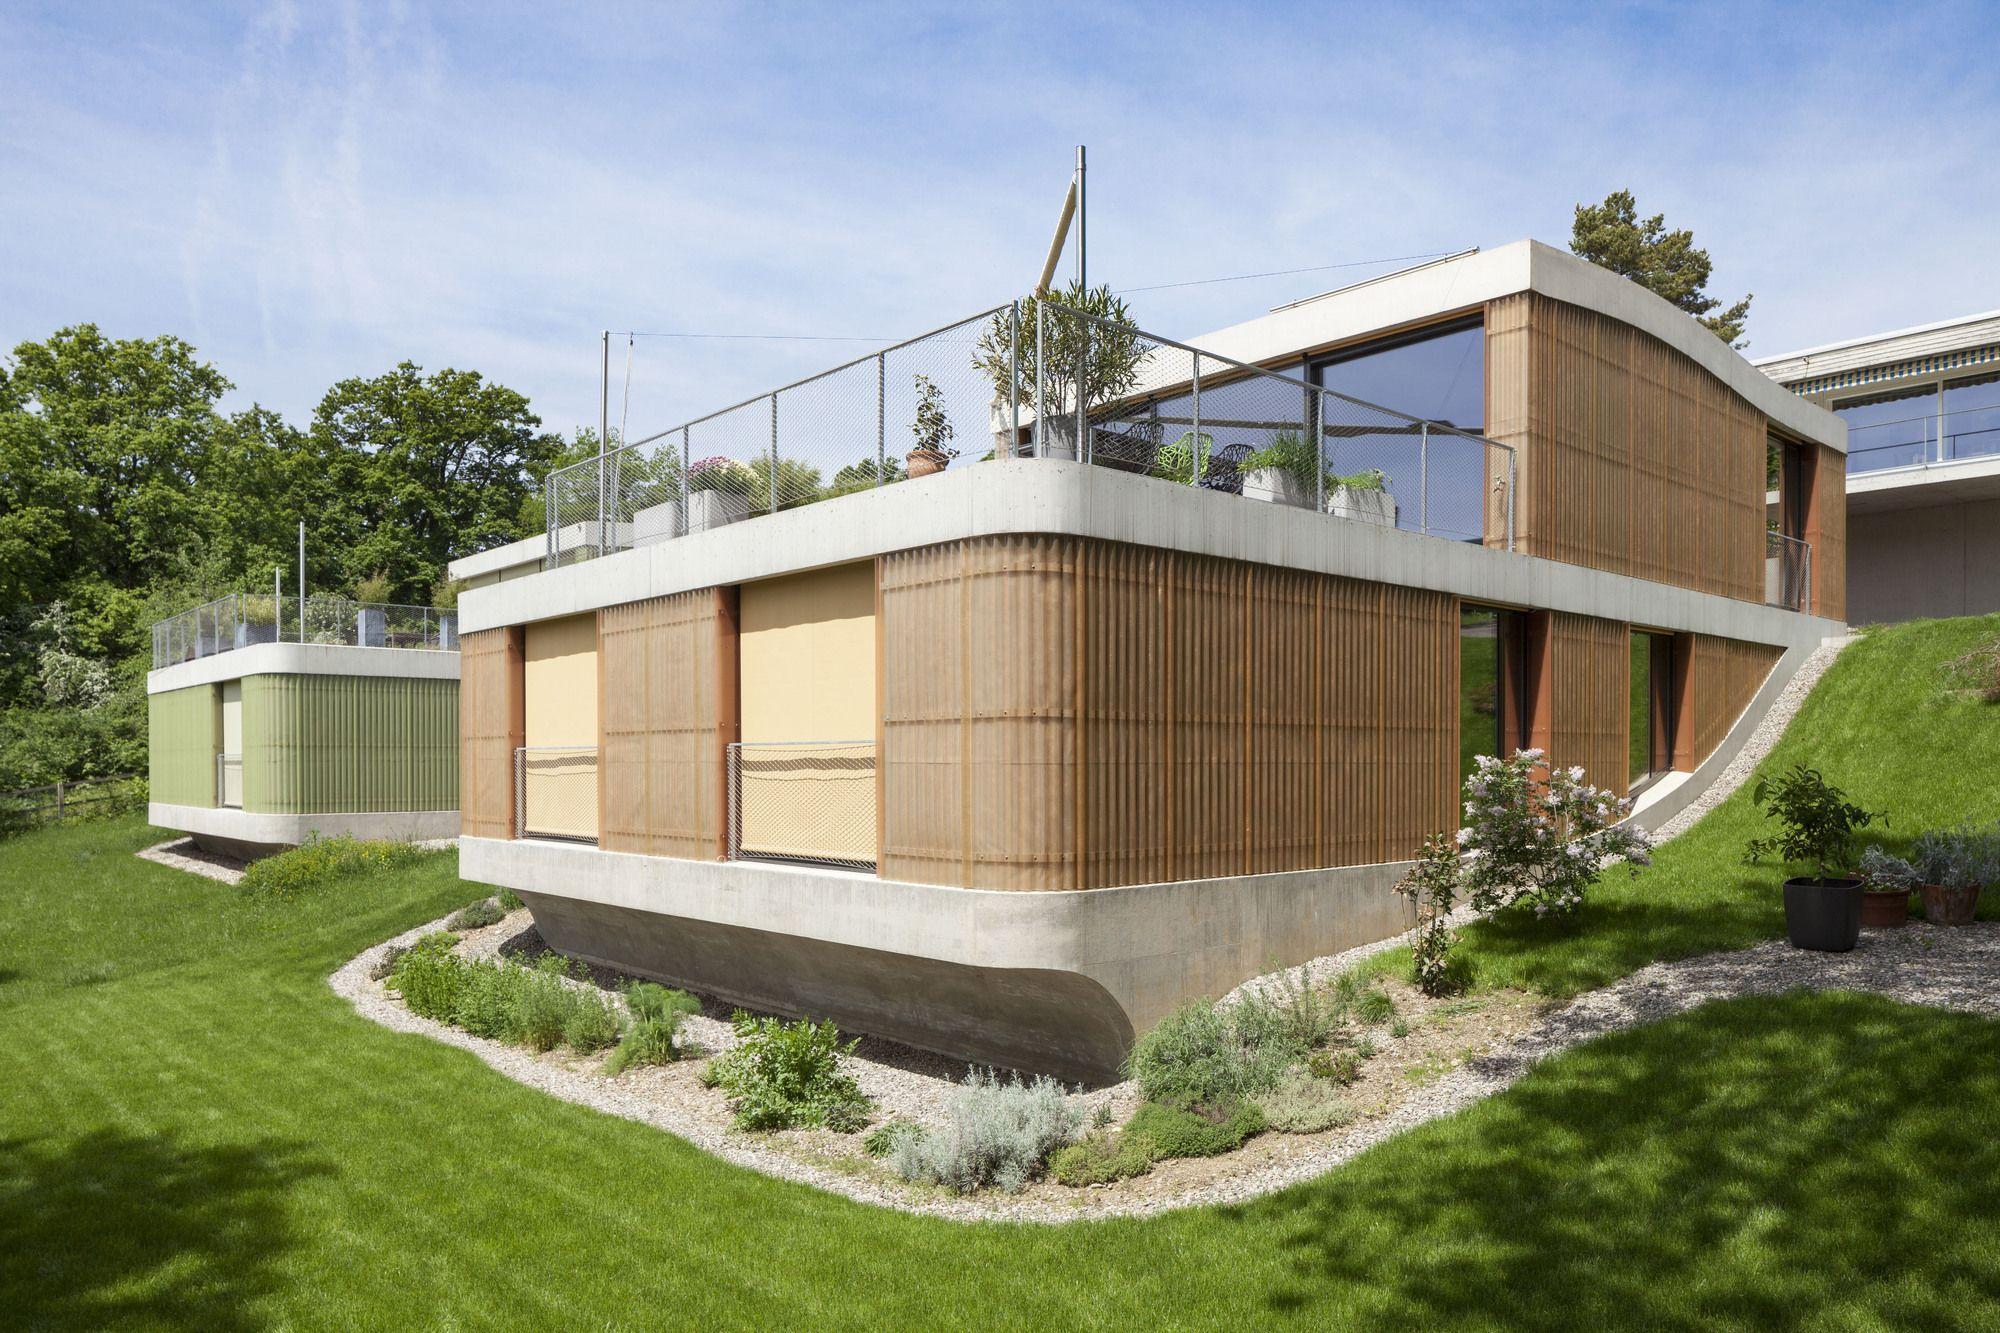 Casas en Wygärtli / Beck + Oser Architekten   Plataforma Arquitectura